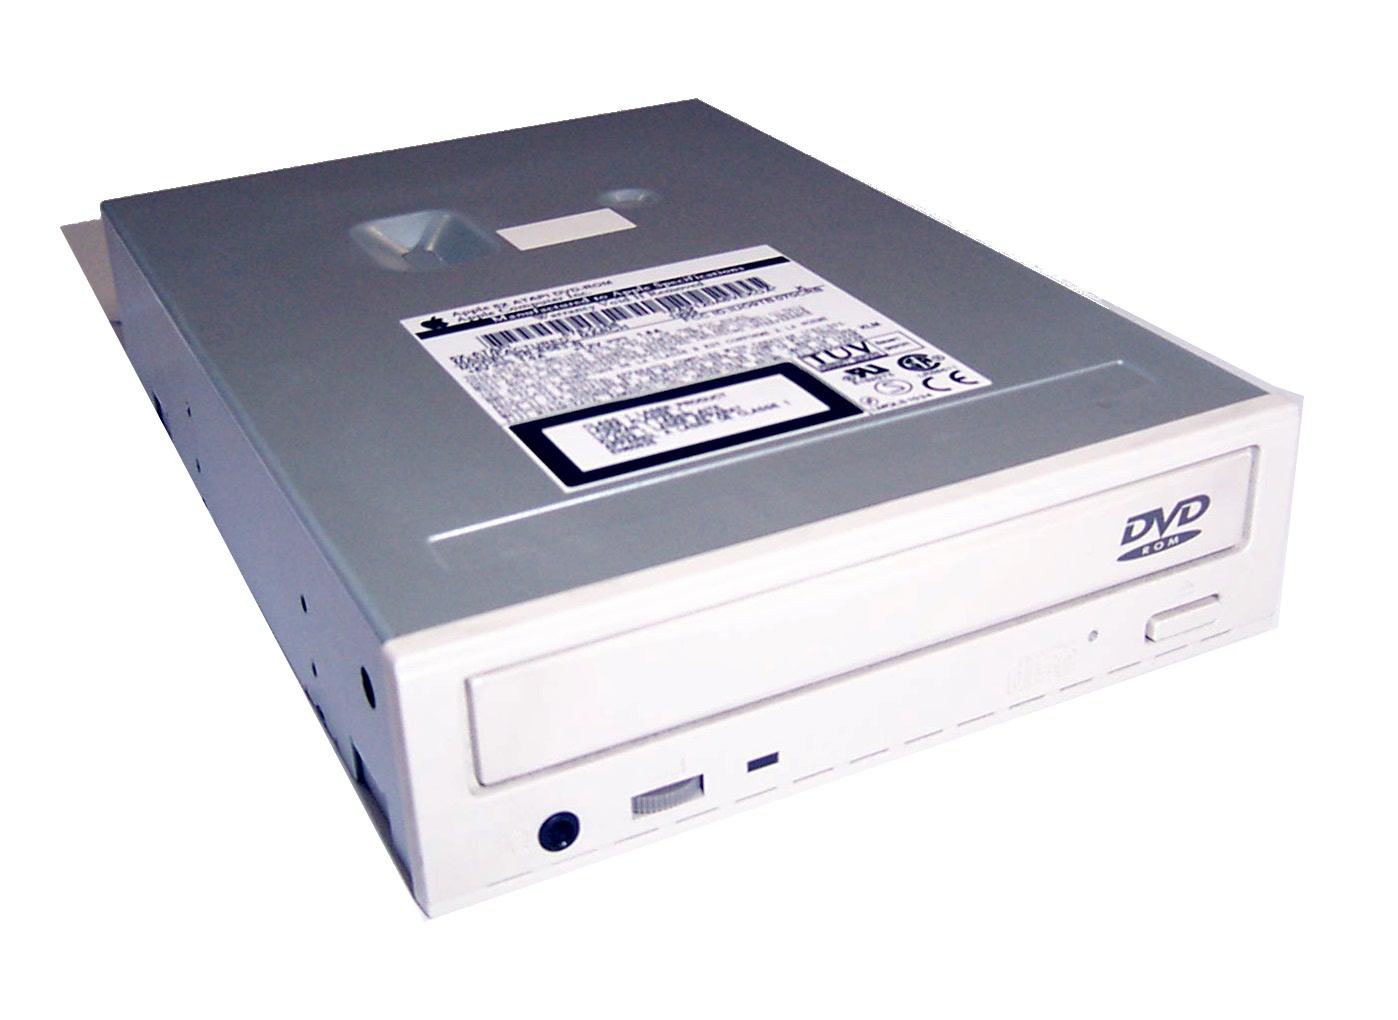 Software for Mashita DVD RAM UJS